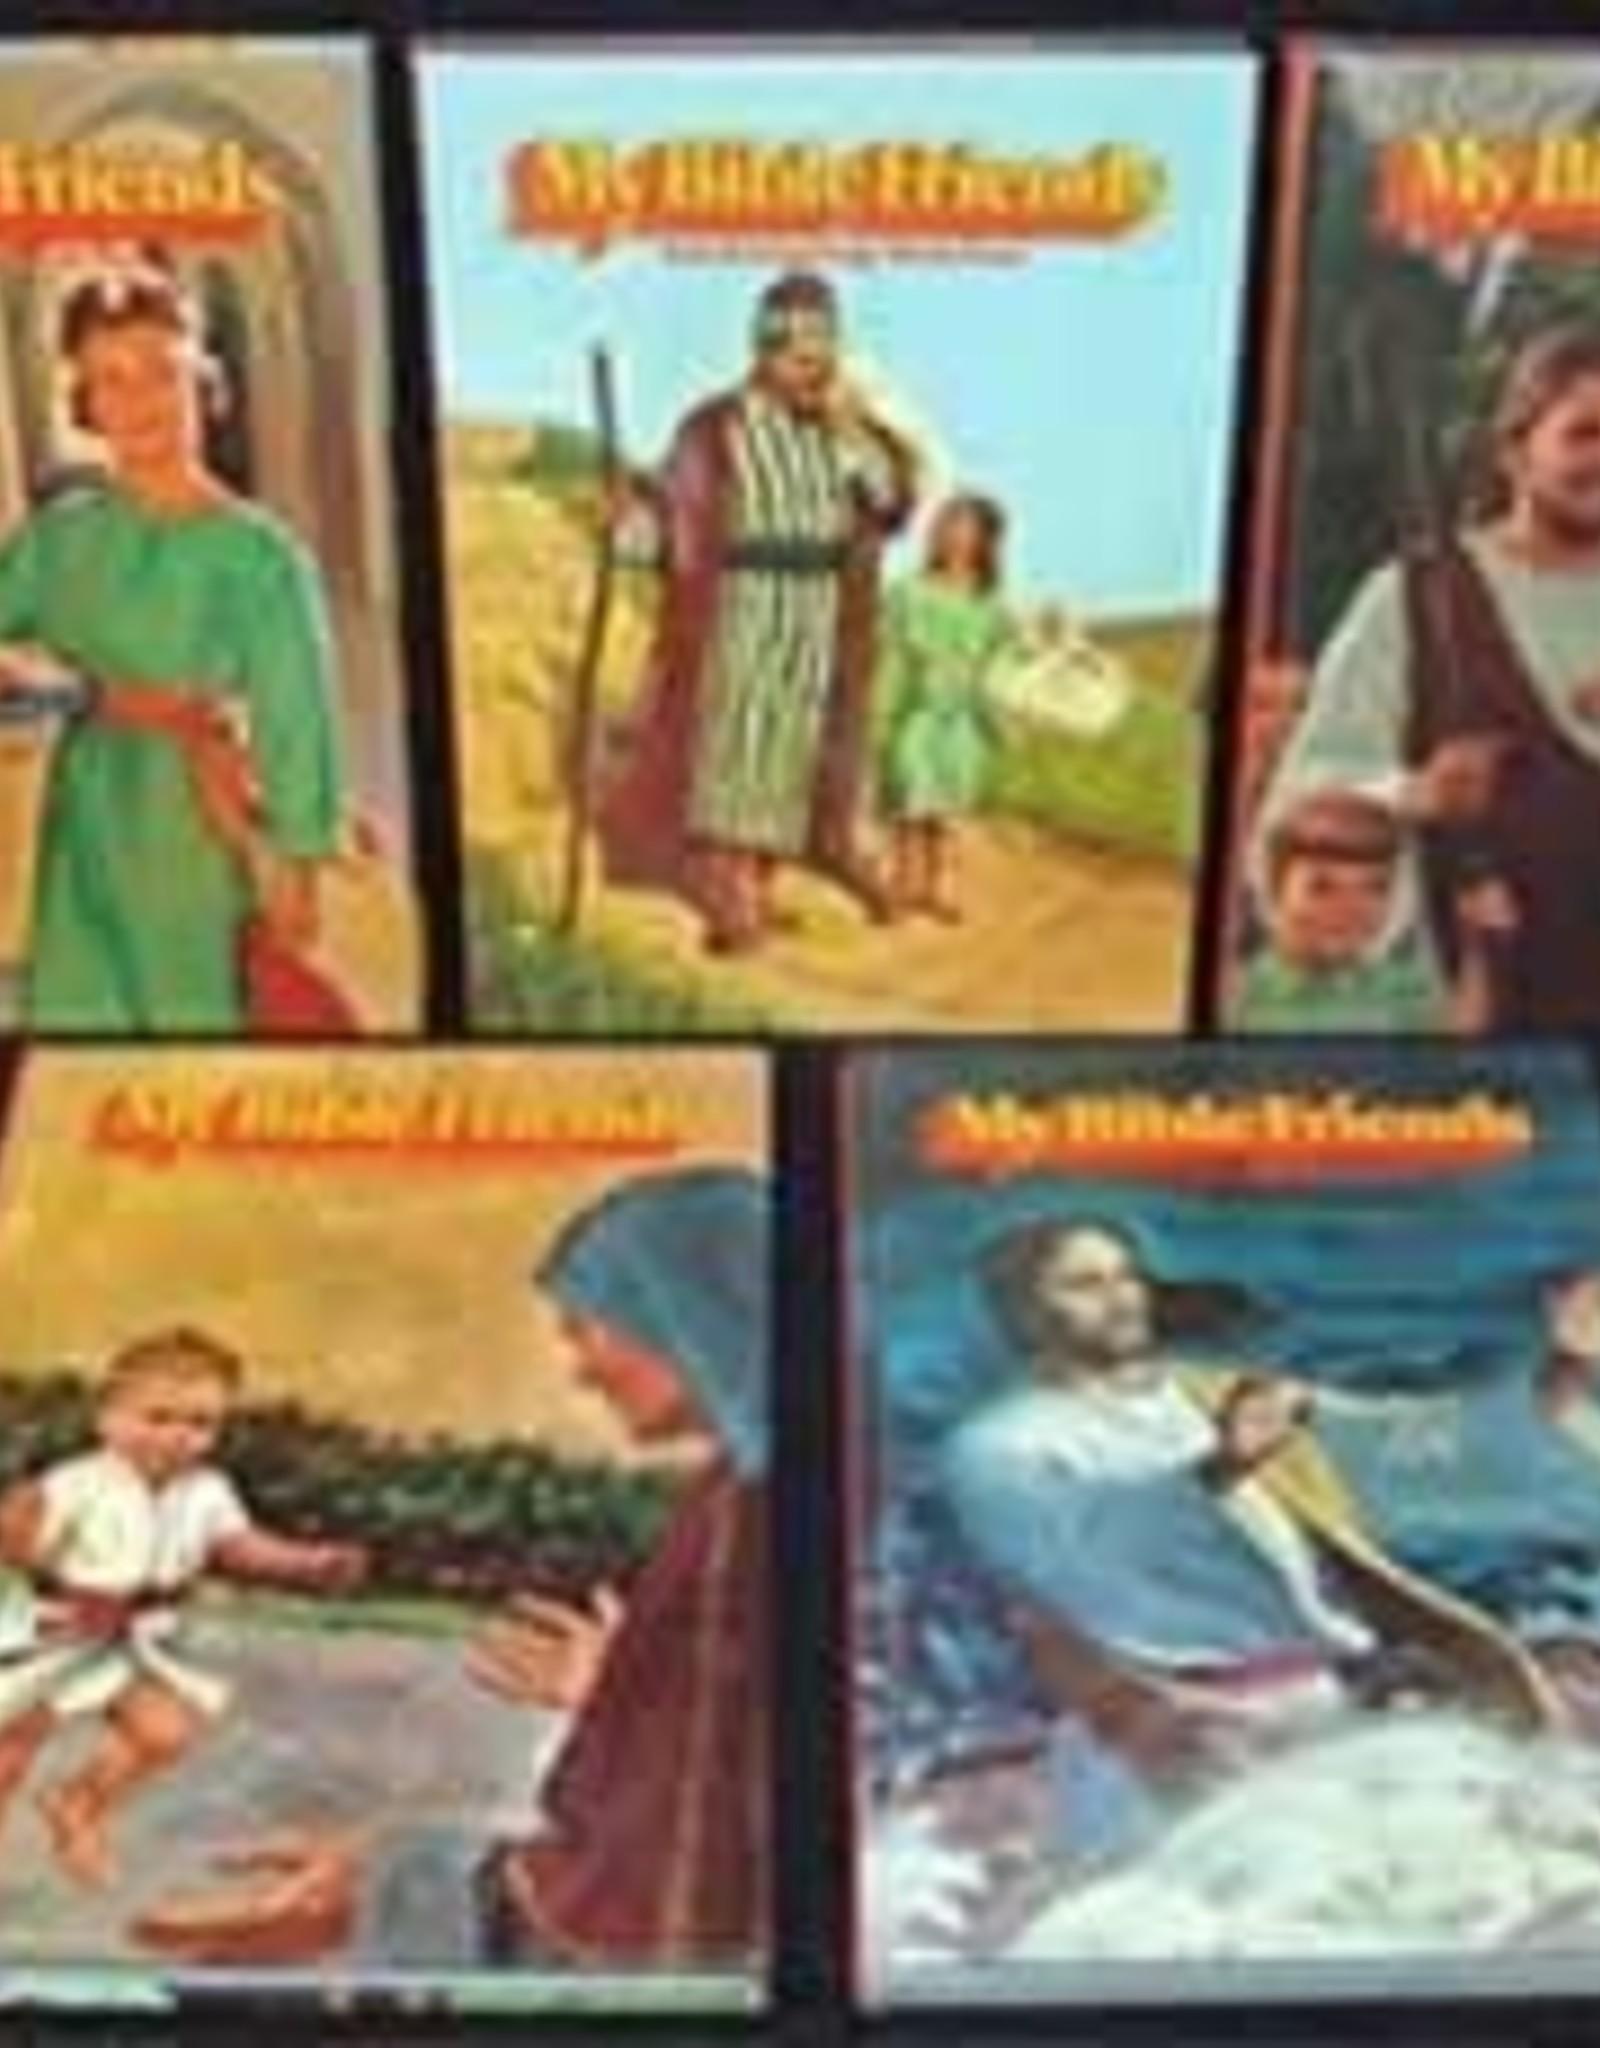 Etta B. Degerring My Bible Friends - set of 5 volumes